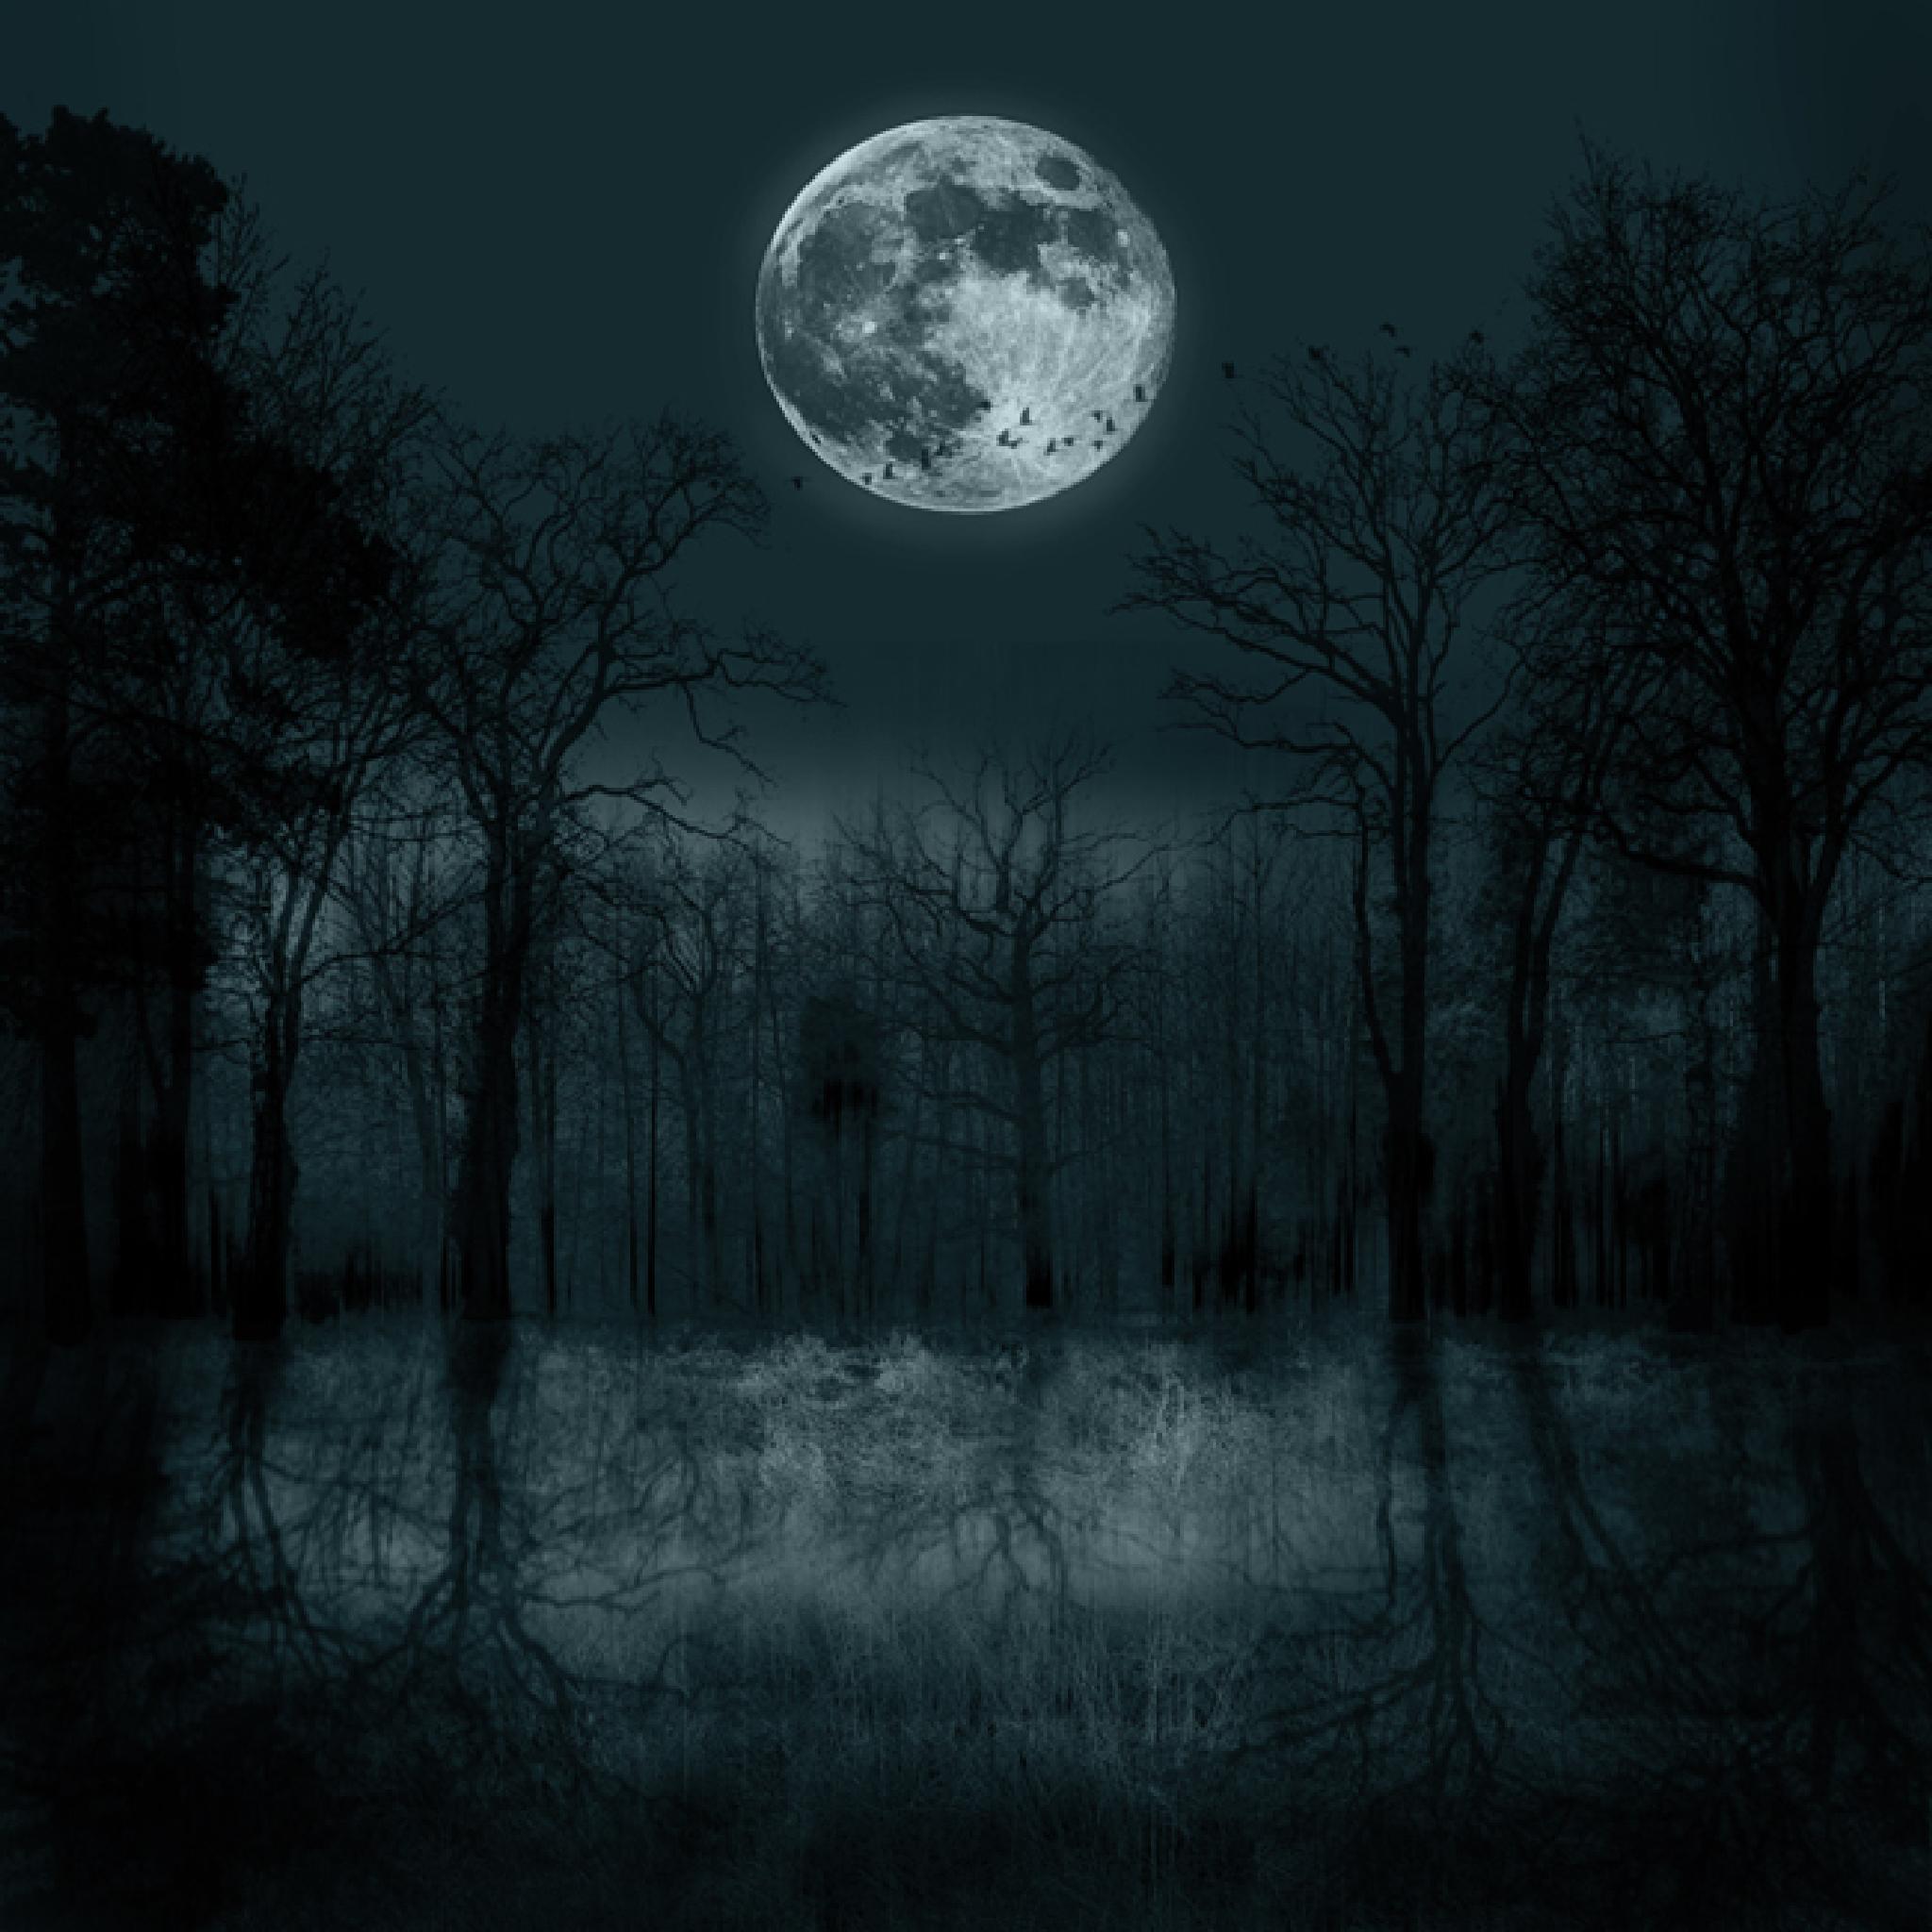 Luna by 2marcus